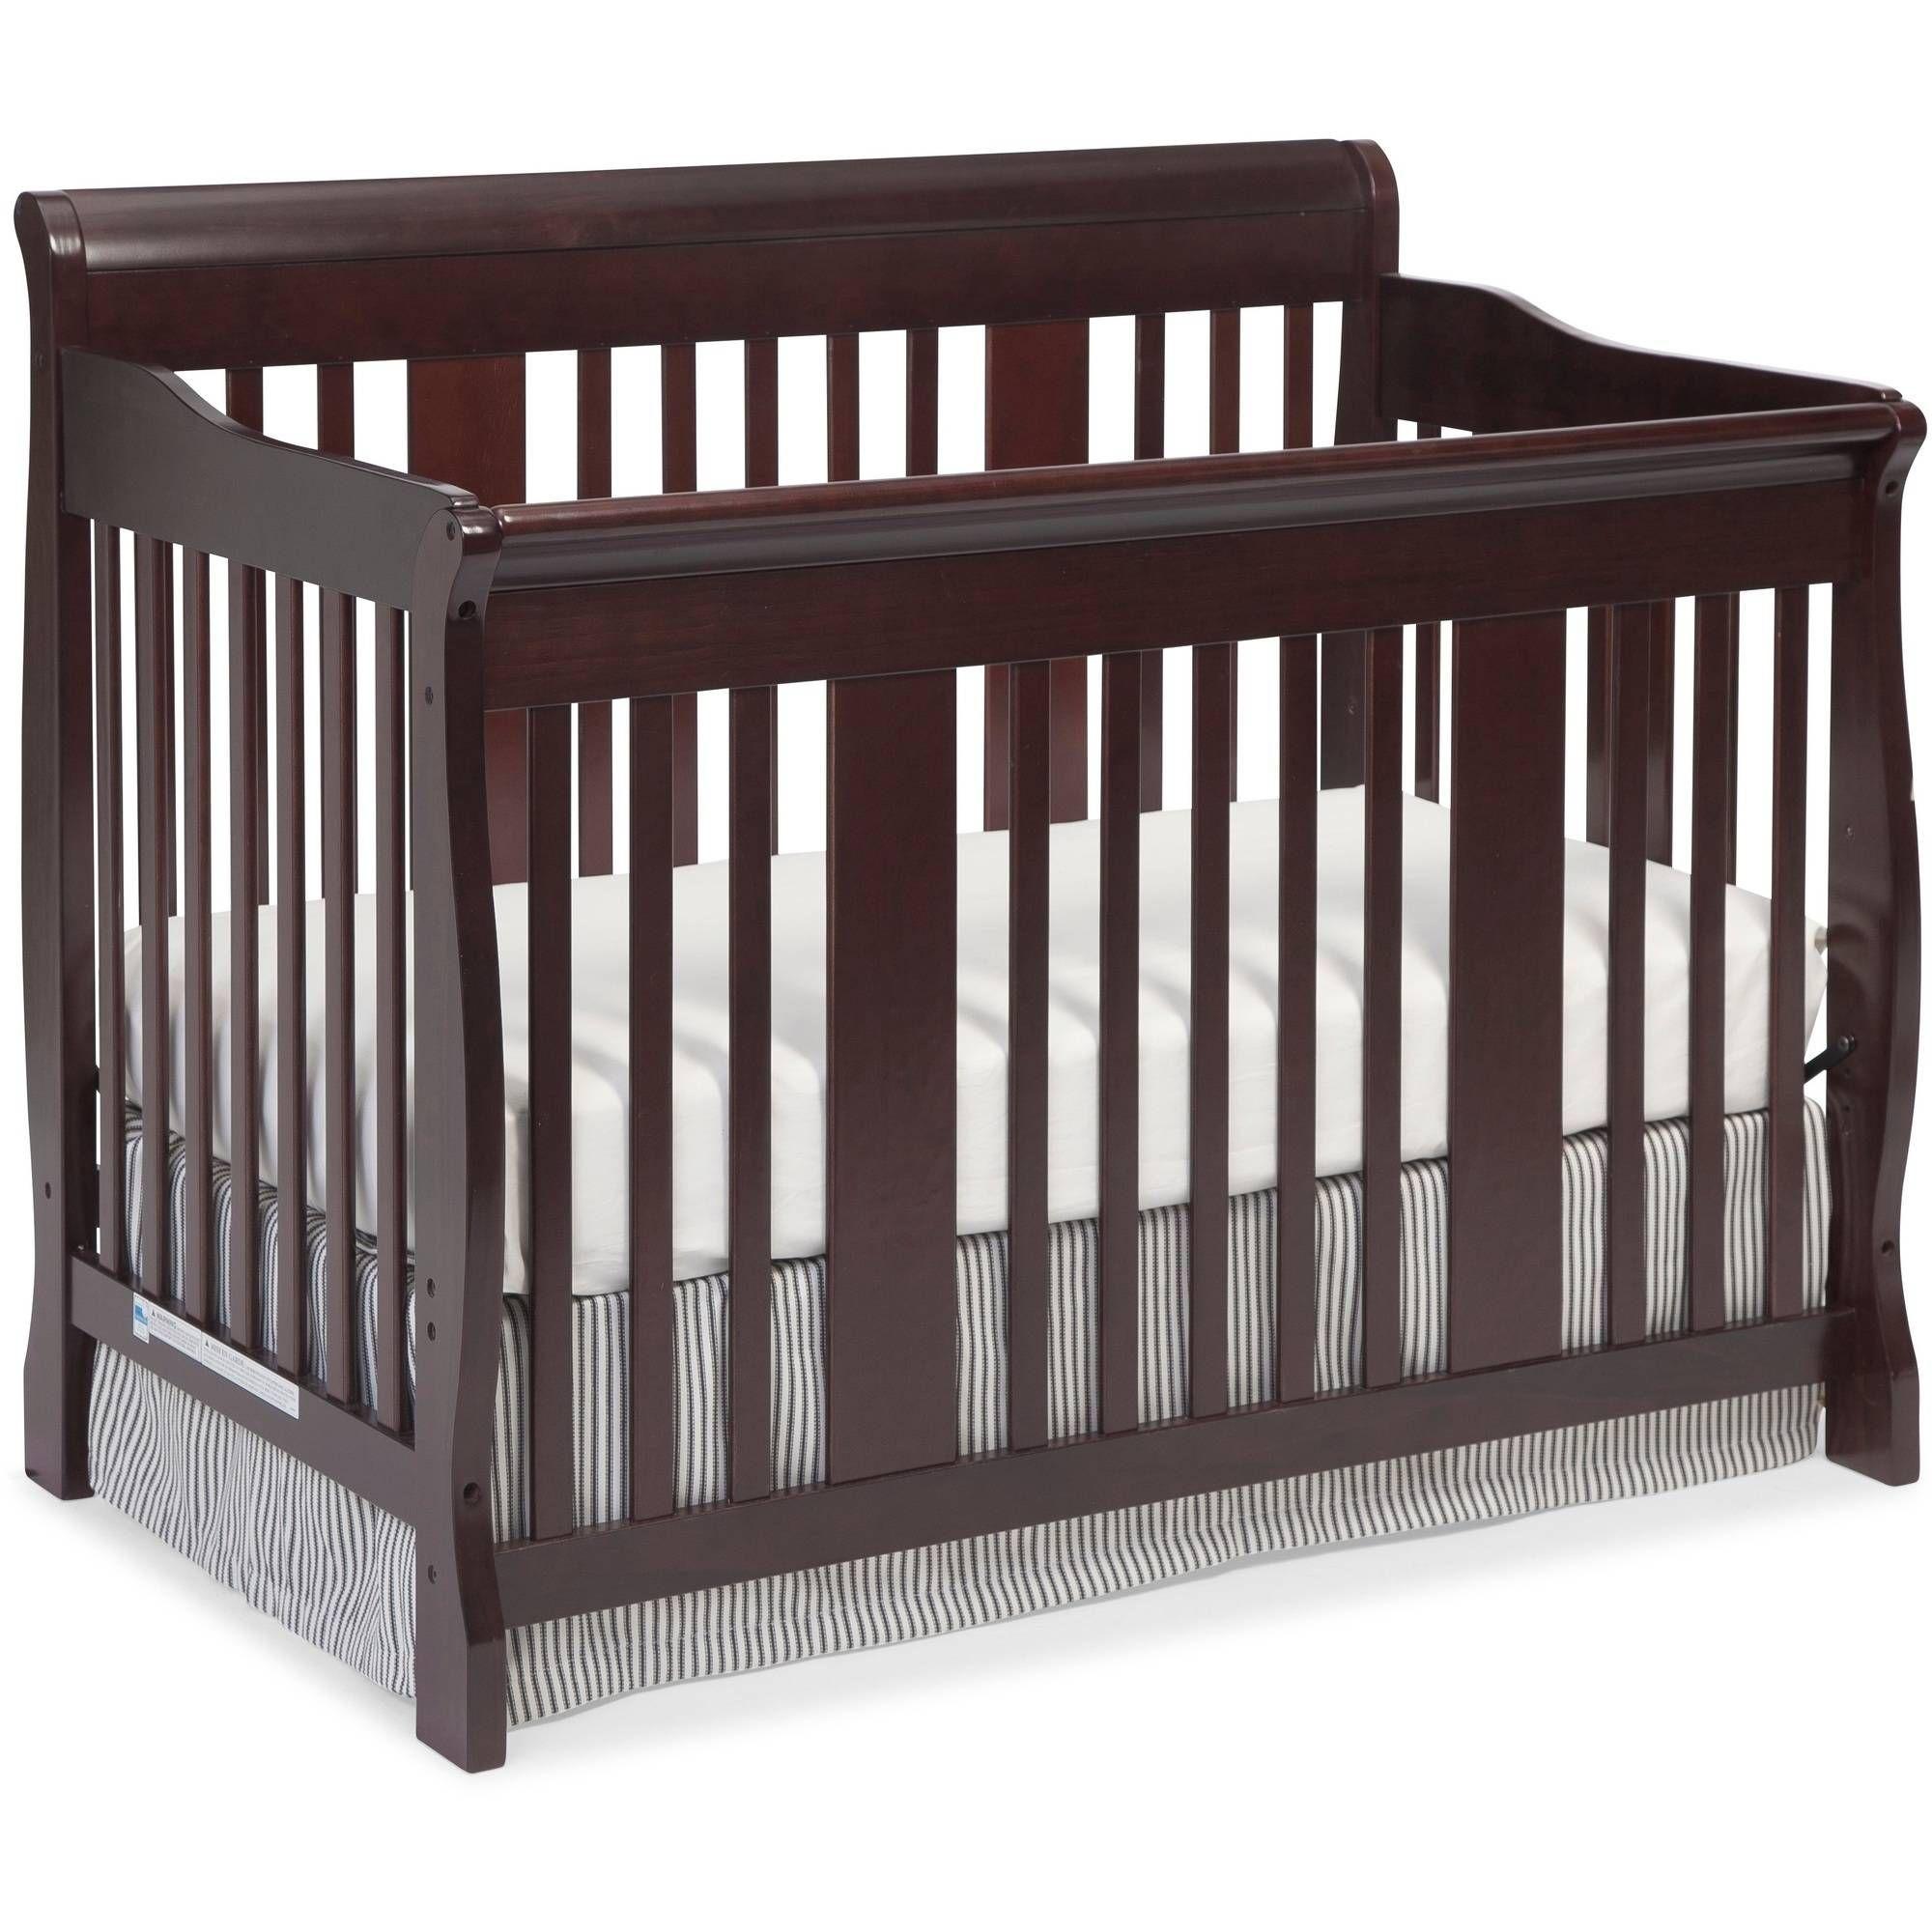 Baby Best Baby Cribs Convertible Crib Cribs